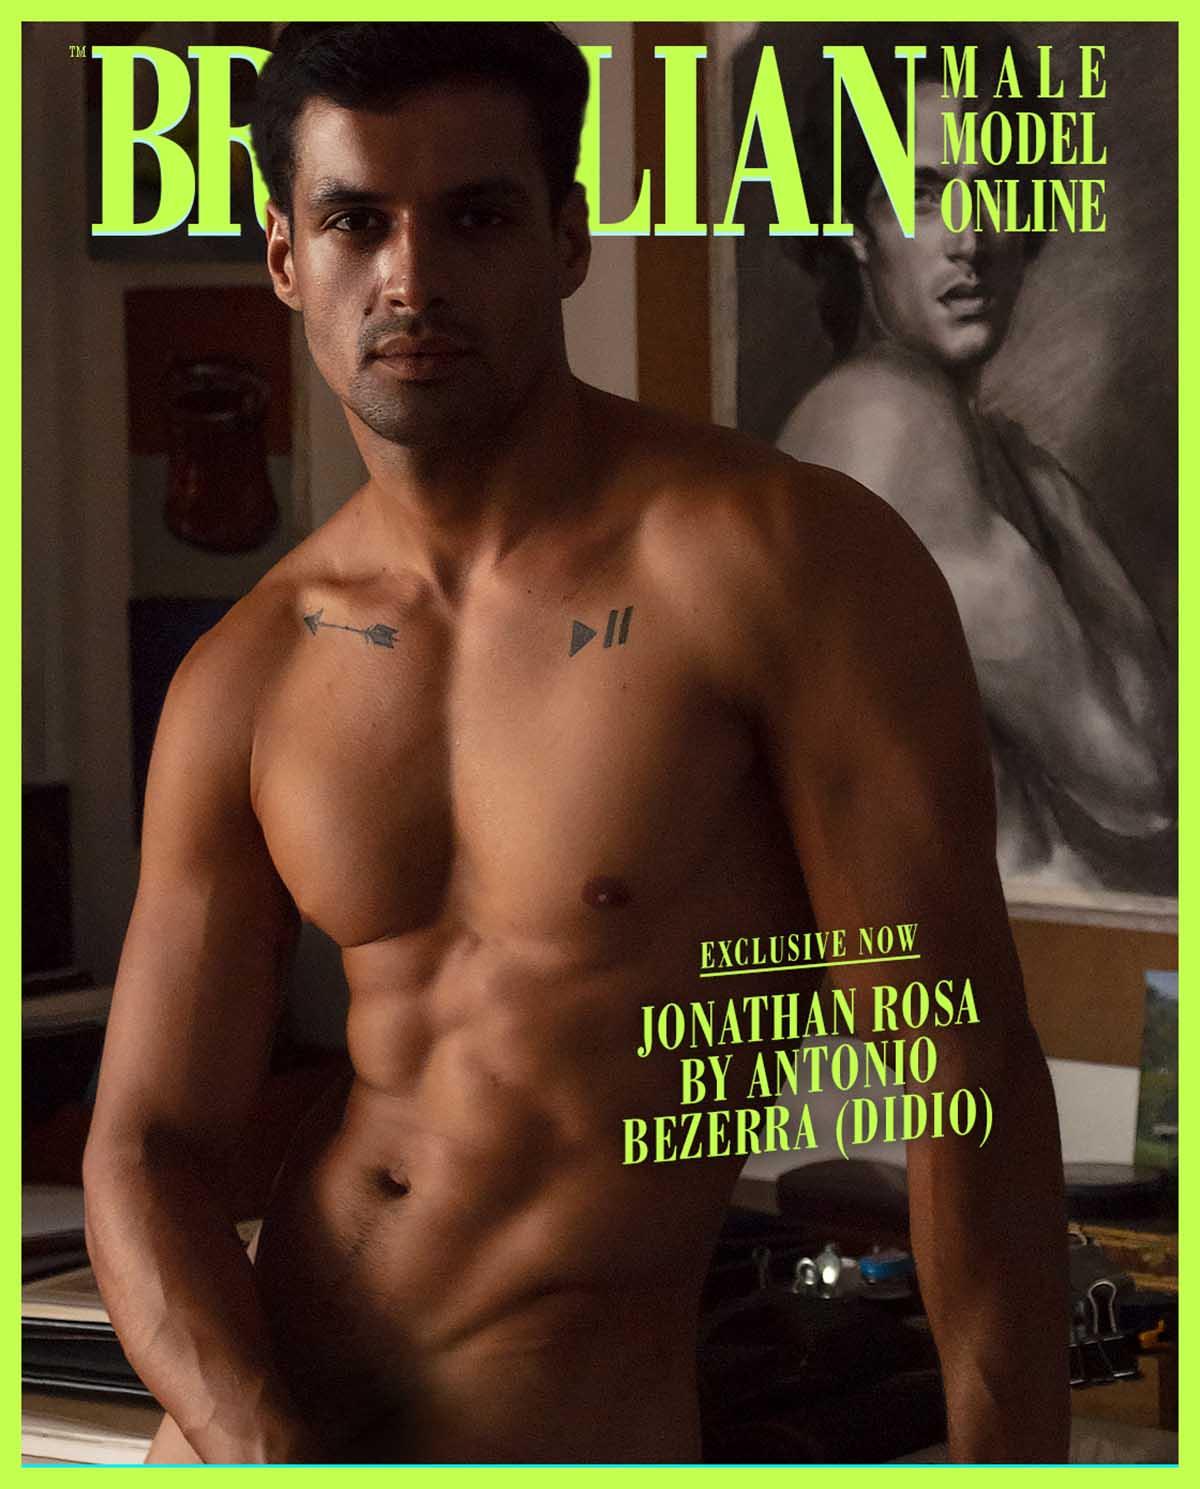 Jonathan Rosa X Antonio Bezerra (Didio) X Brazilian Male Model